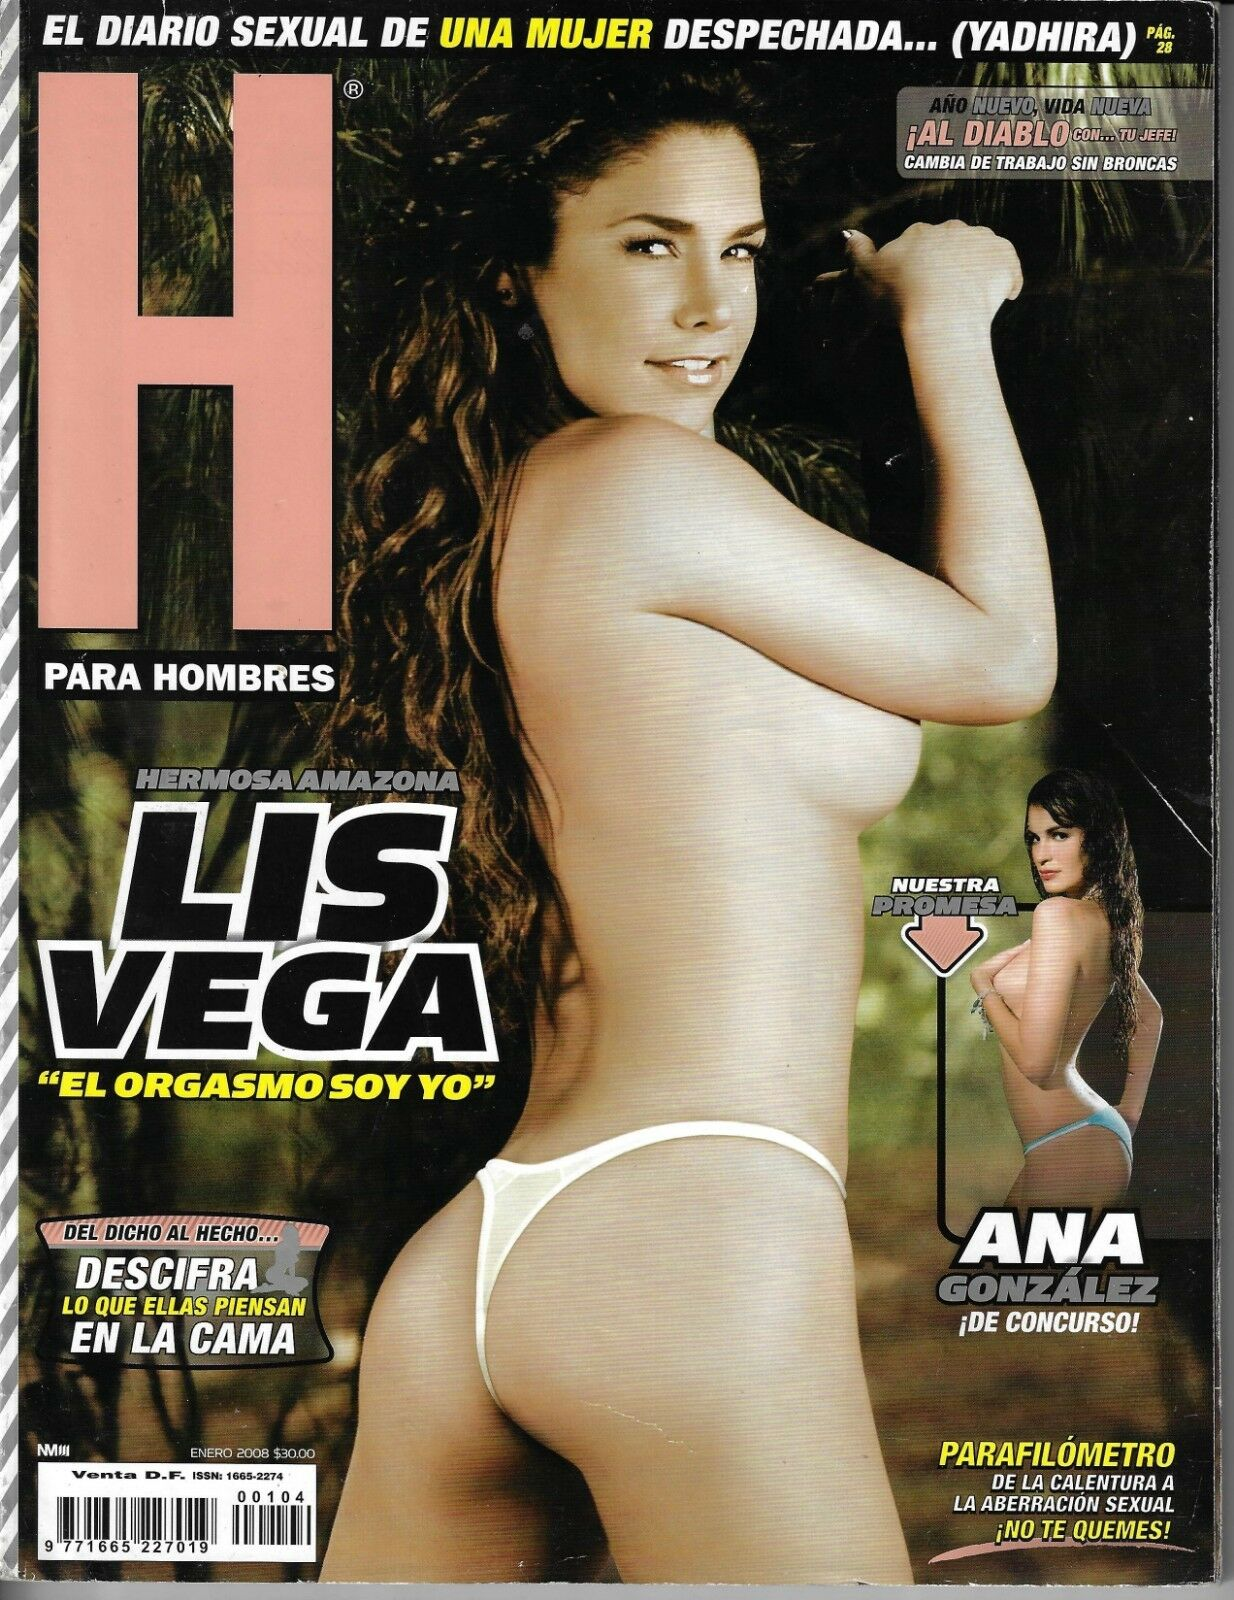 Altair Jarabo Revista H adriana riveramelo h para hombres magazine 2008 altair jarabo jessica alba  fox